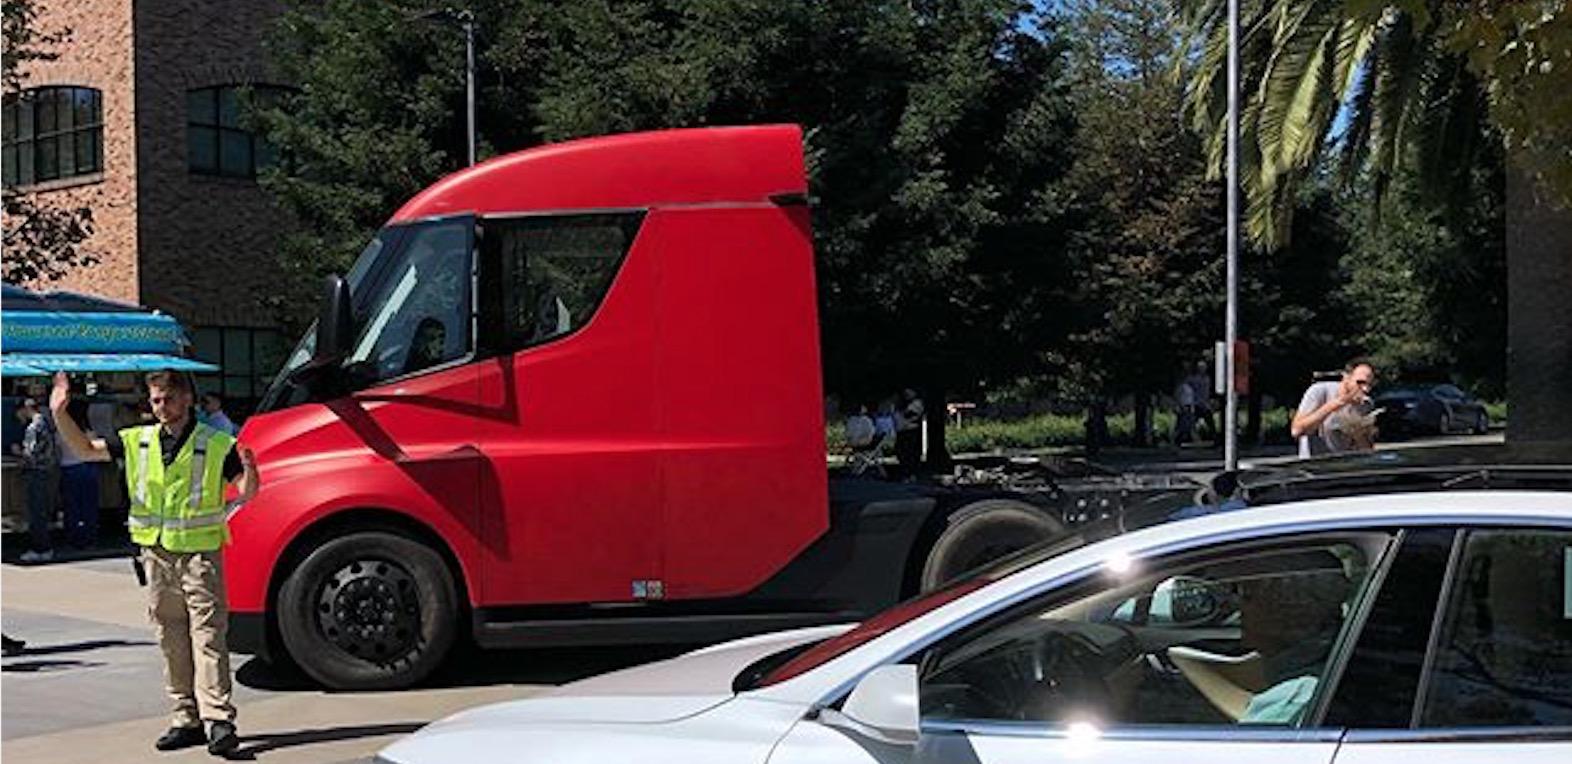 Tesla Semi prototype spotted at Pixar's headquarters - Electrek